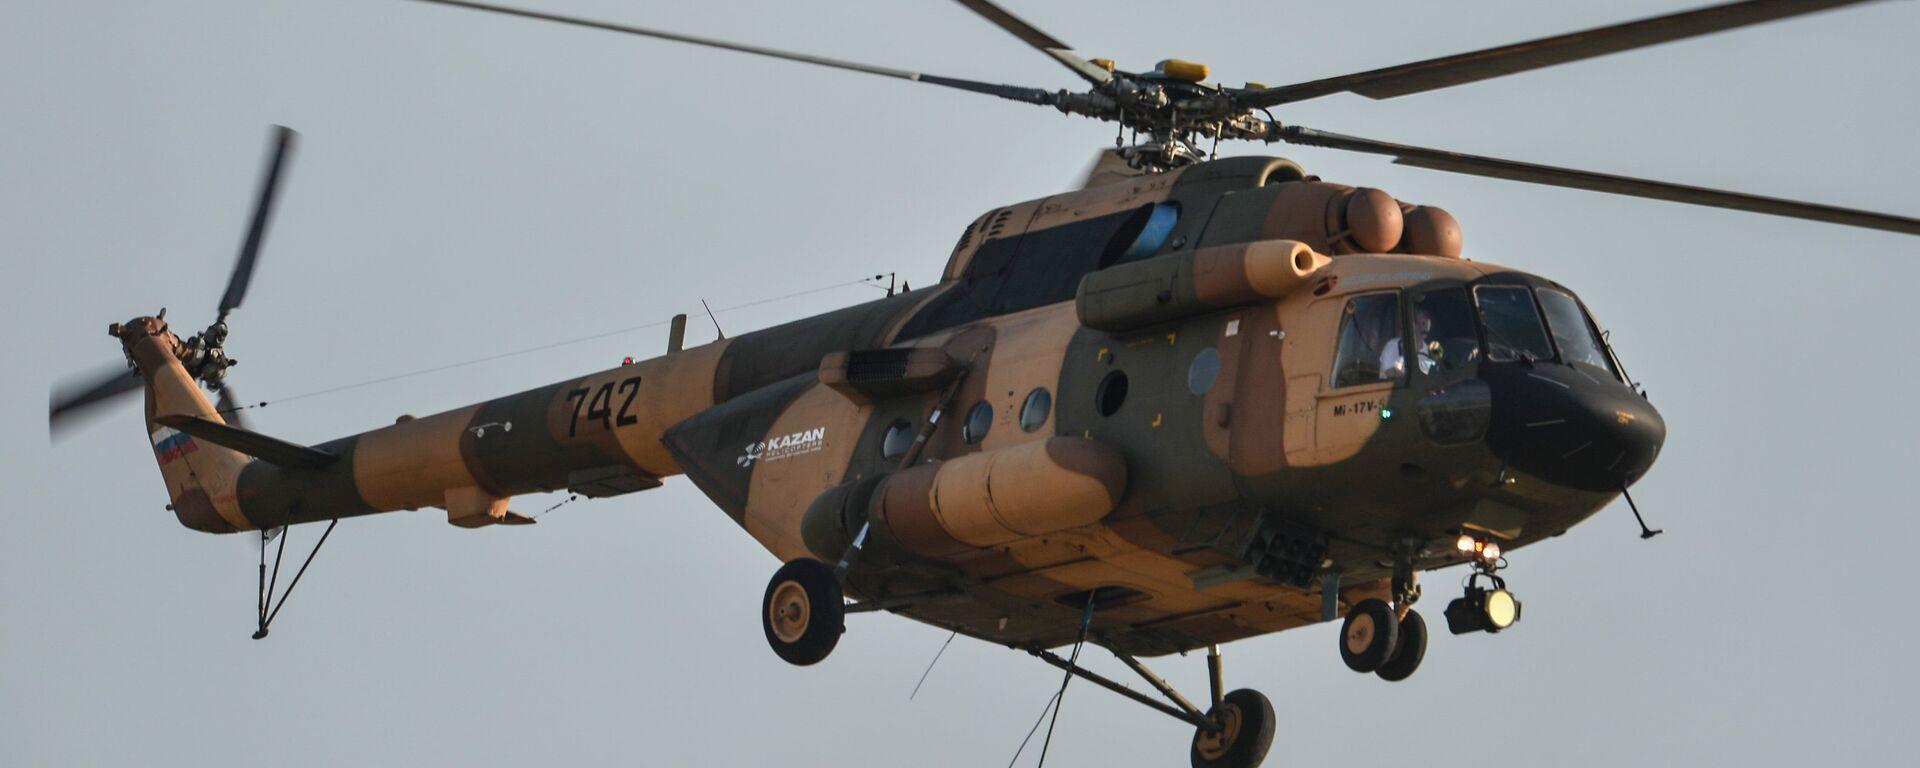 Un helicóptero ruso Mi-17V5 - Sputnik Mundo, 1920, 12.08.2021